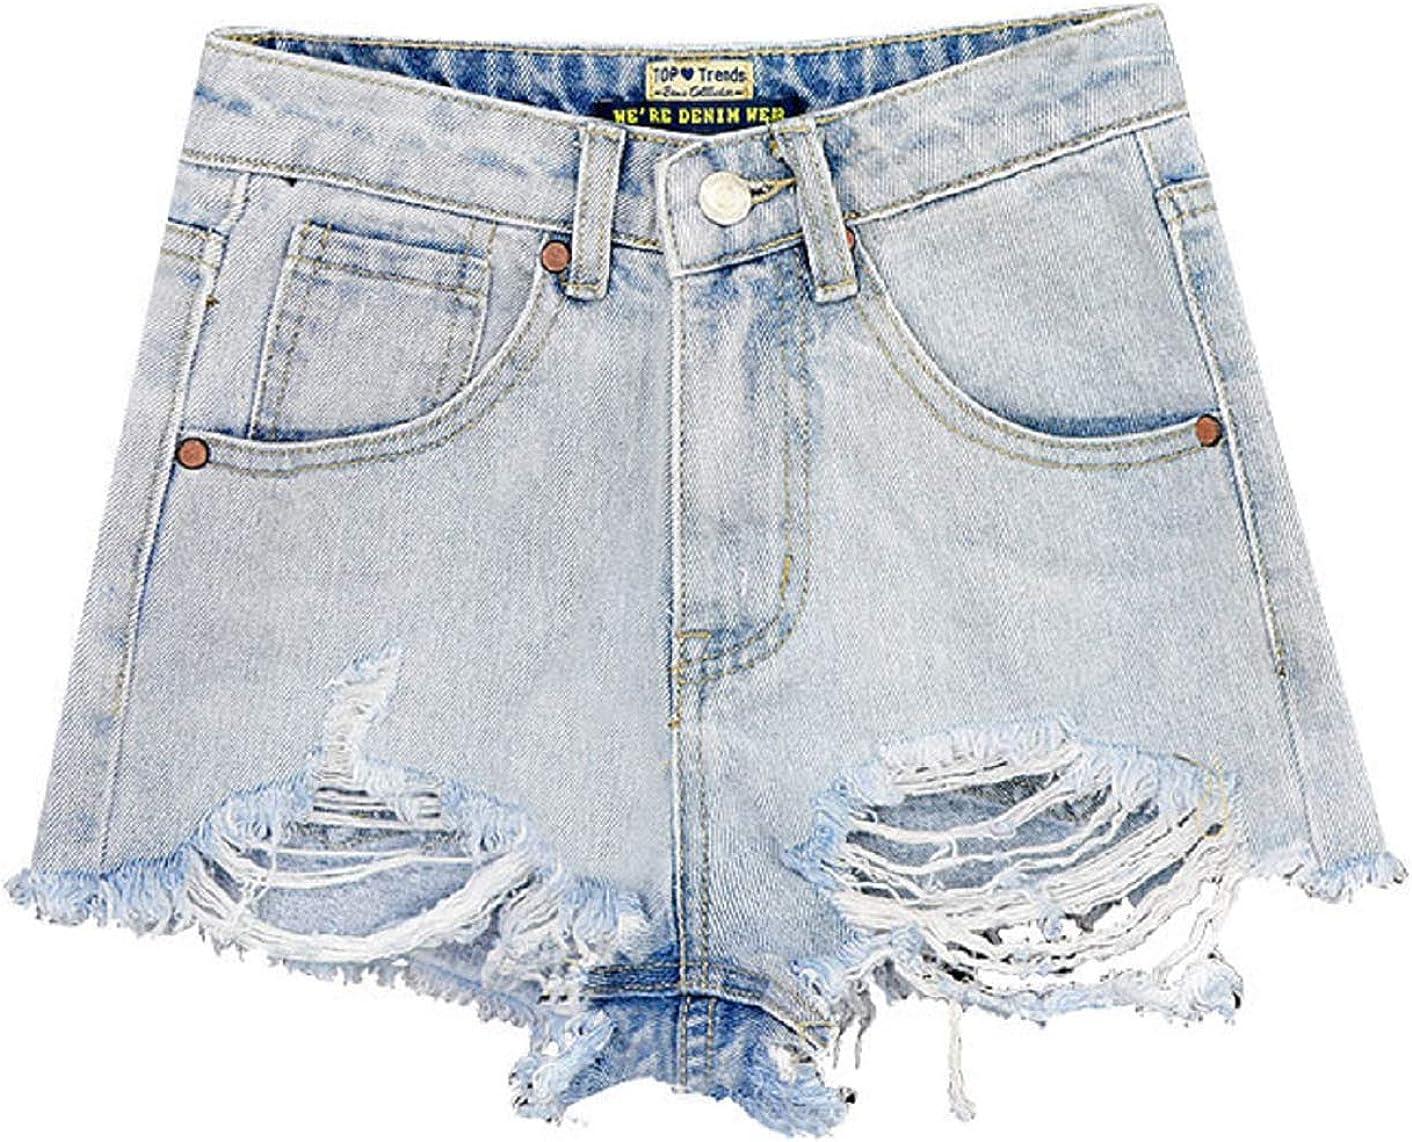 CHARTOU Women's High Waist Stretch Distressed Raw Tassel Faded Hot Denim Shorts